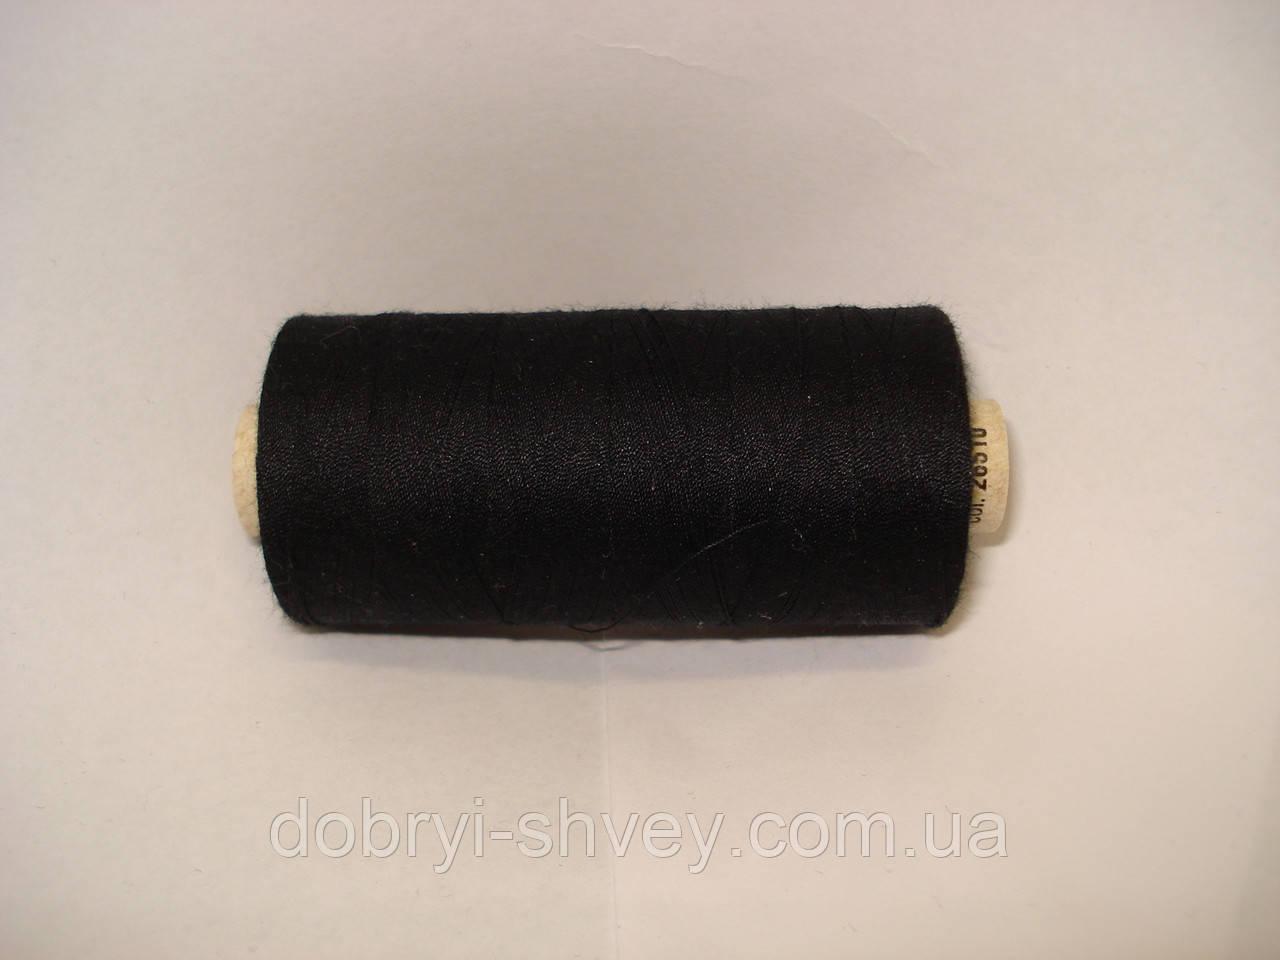 Нитка ALTERFIL №120 1000м.col 26510 черный